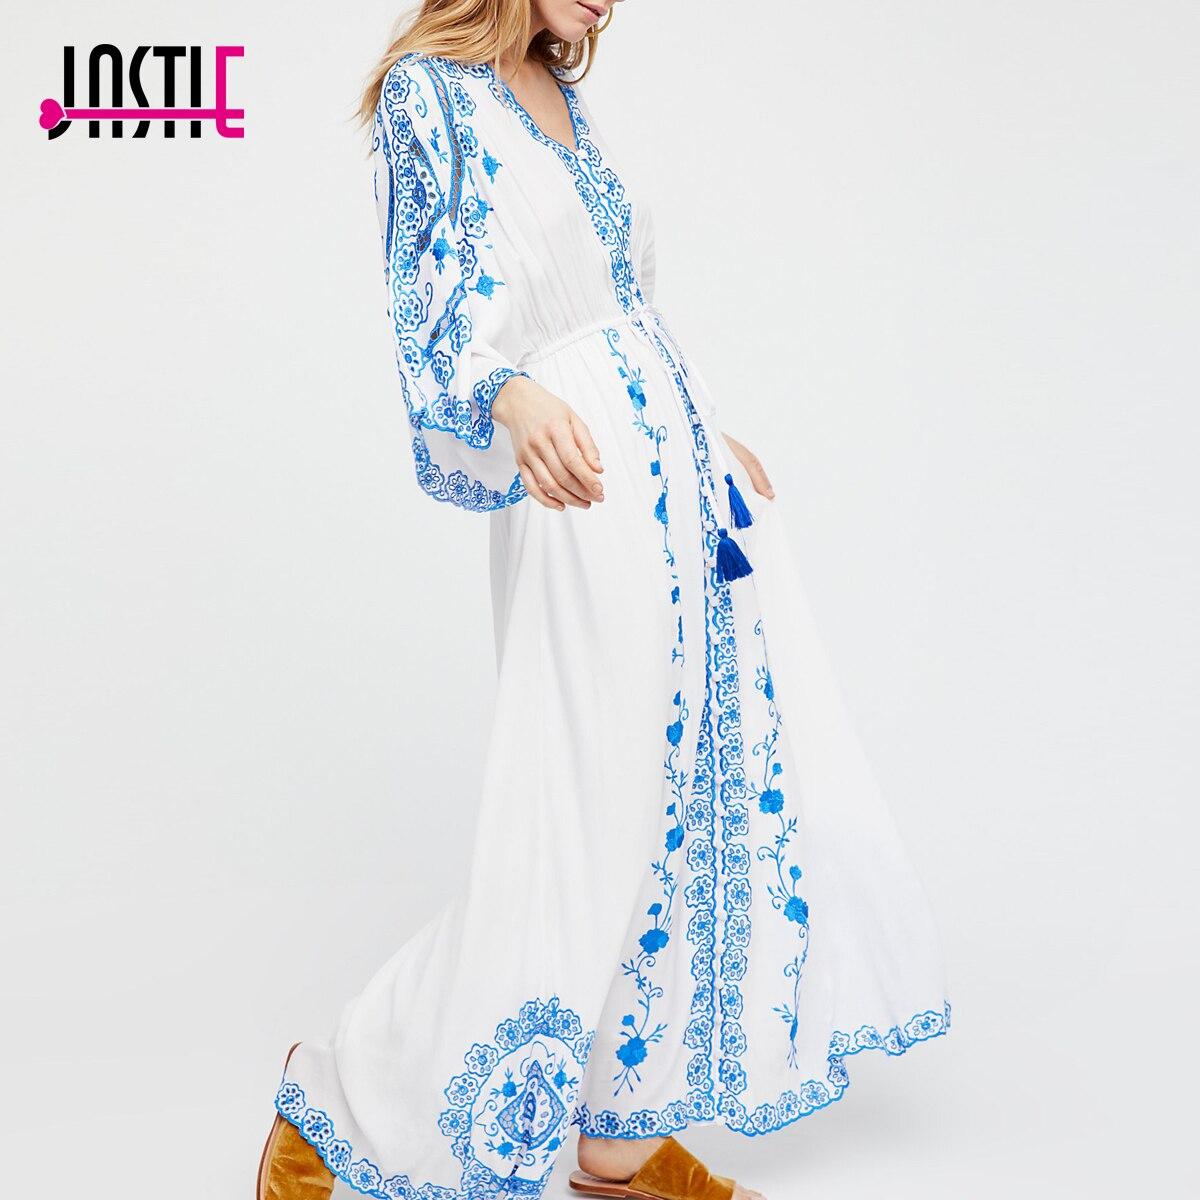 Jastie 로얄 블루 자수 맥시 드레스 버튼 v 넥 여성 드레스 drawstring 허리 기모노 슬리브 캐주얼 드레스 2018 봄-에서드레스부터 여성 의류 의  그룹 1